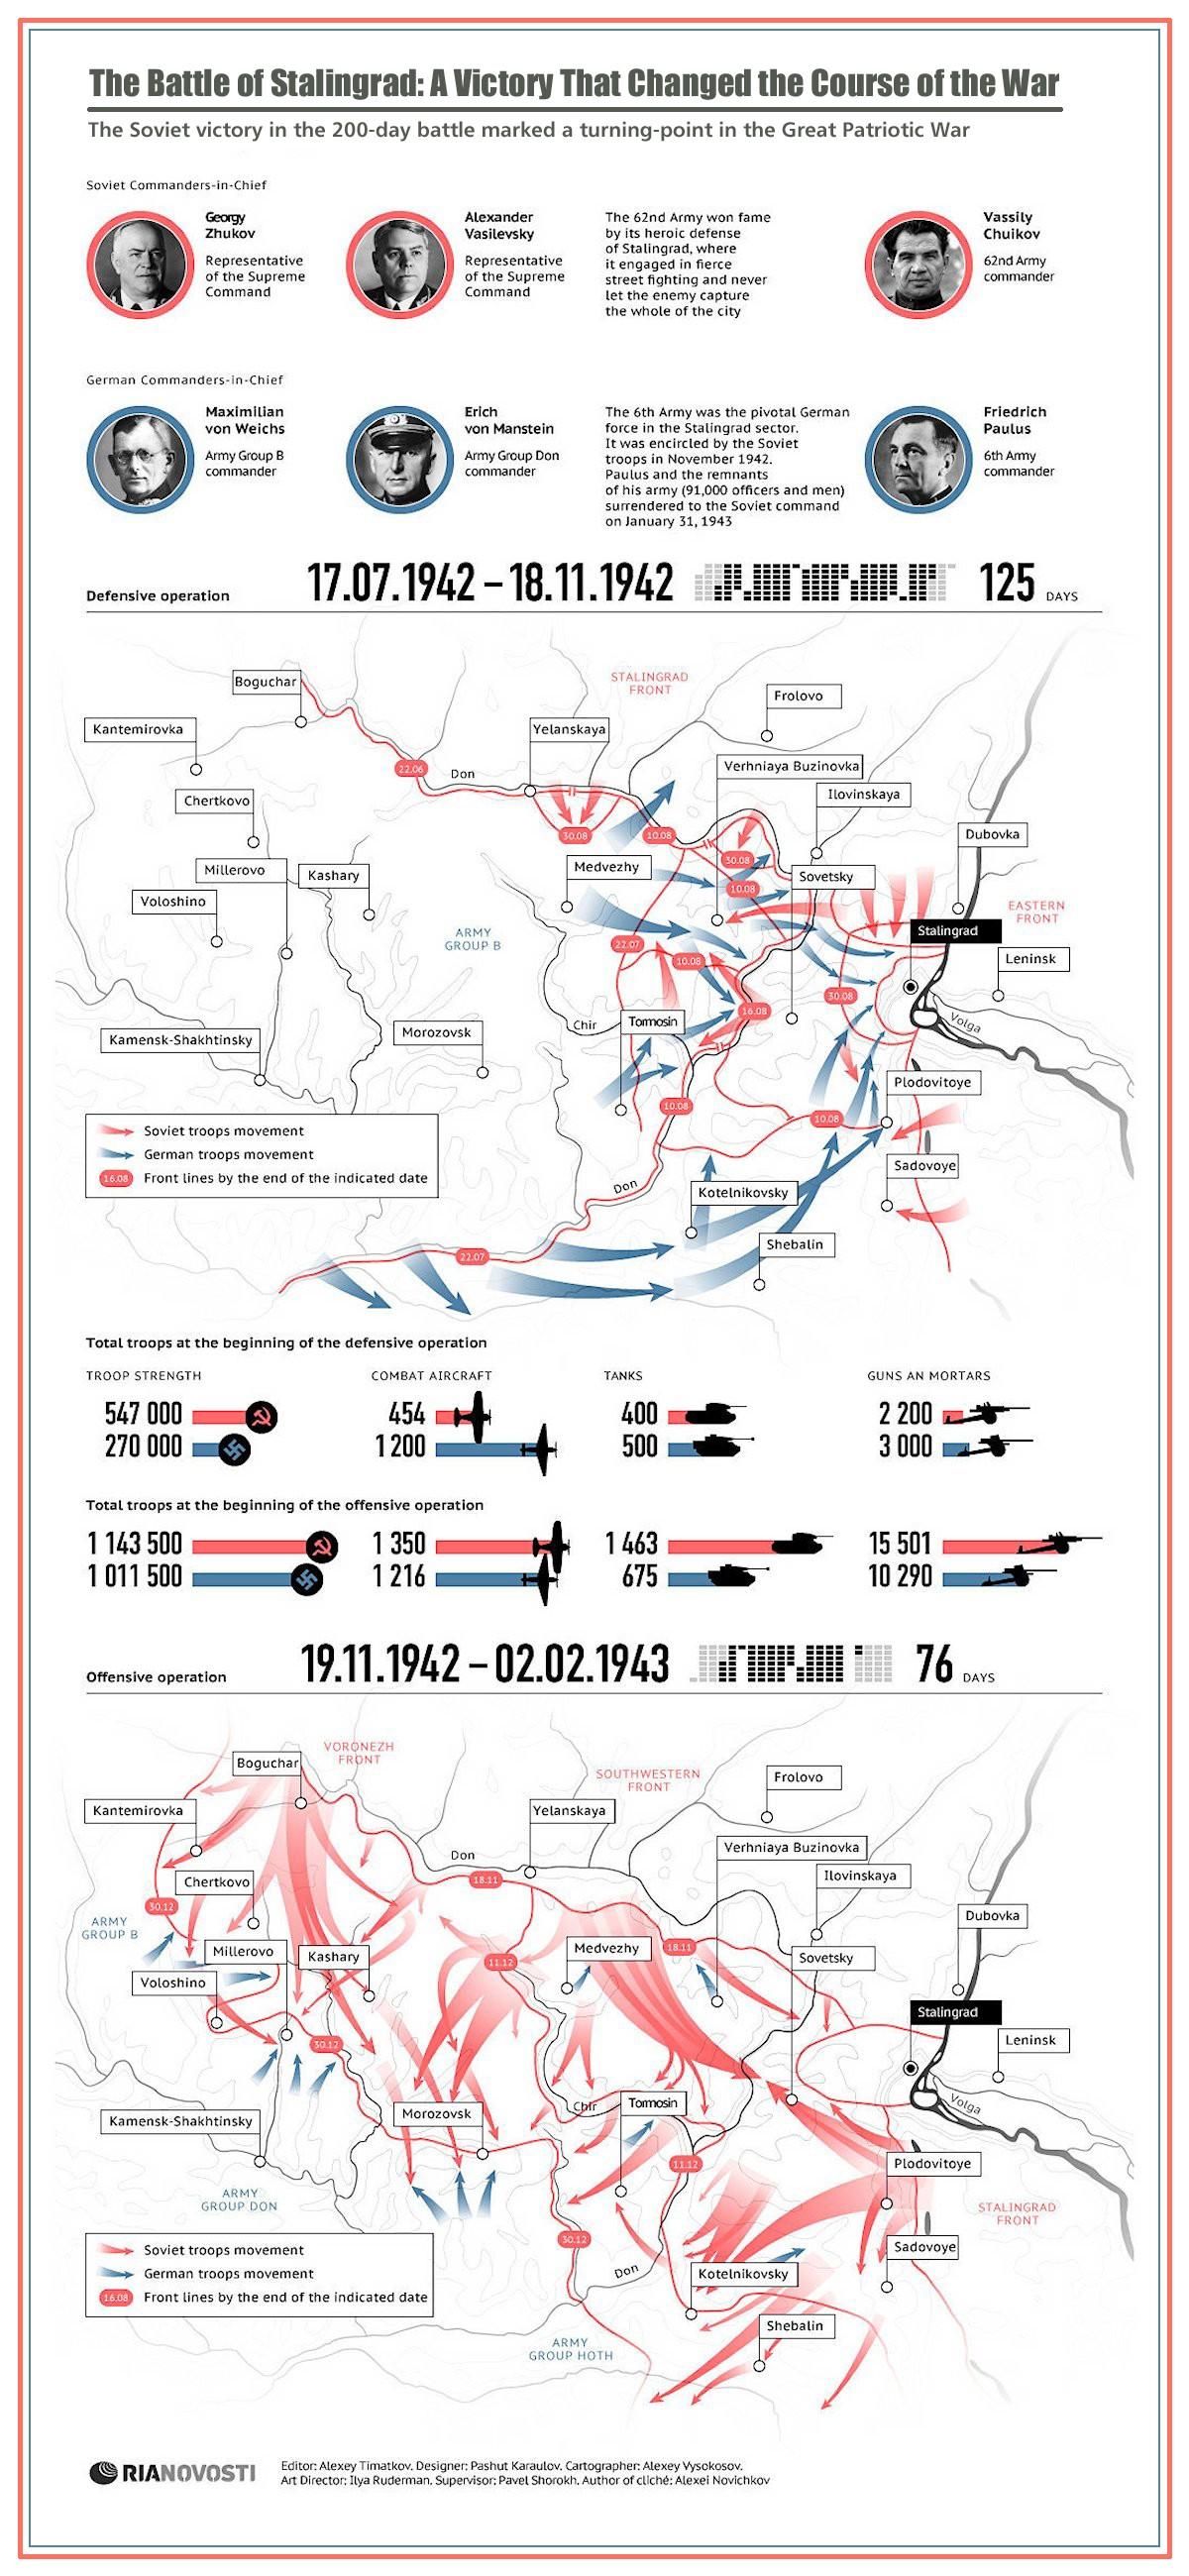 00 RIA-Novosti Infographics. Battle of Stalingrad. 2013